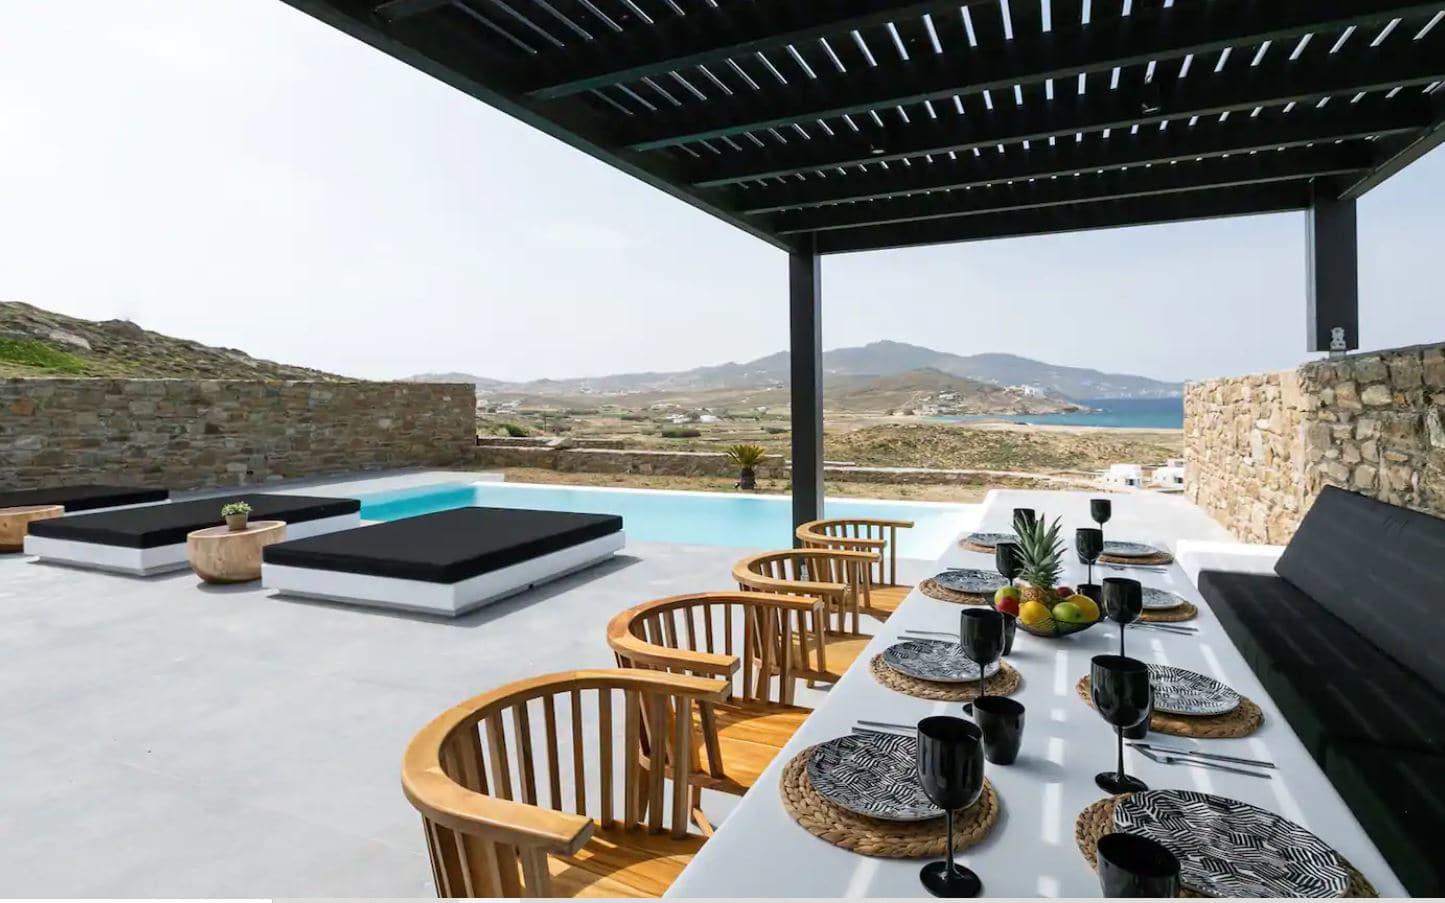 3. Luxurious Villa With Breathtaking Views